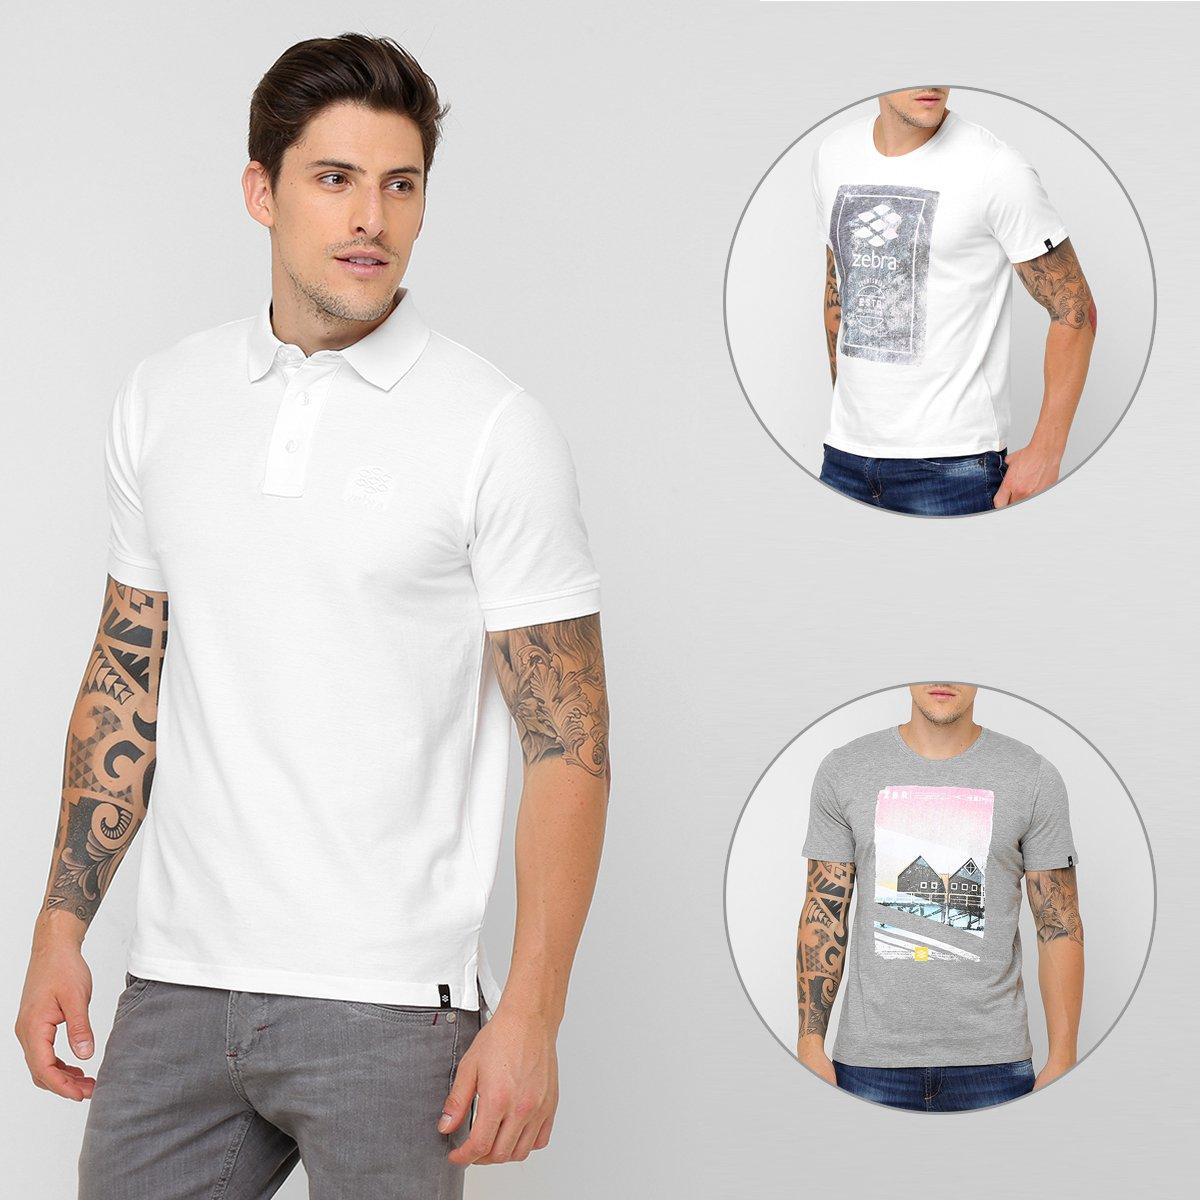 e2b468f5ff Kit Camiseta Zebra Rock Climbing + Camiseta Zebra Australia Coast + Camisa  Polo Zebra Signature - Compre Agora